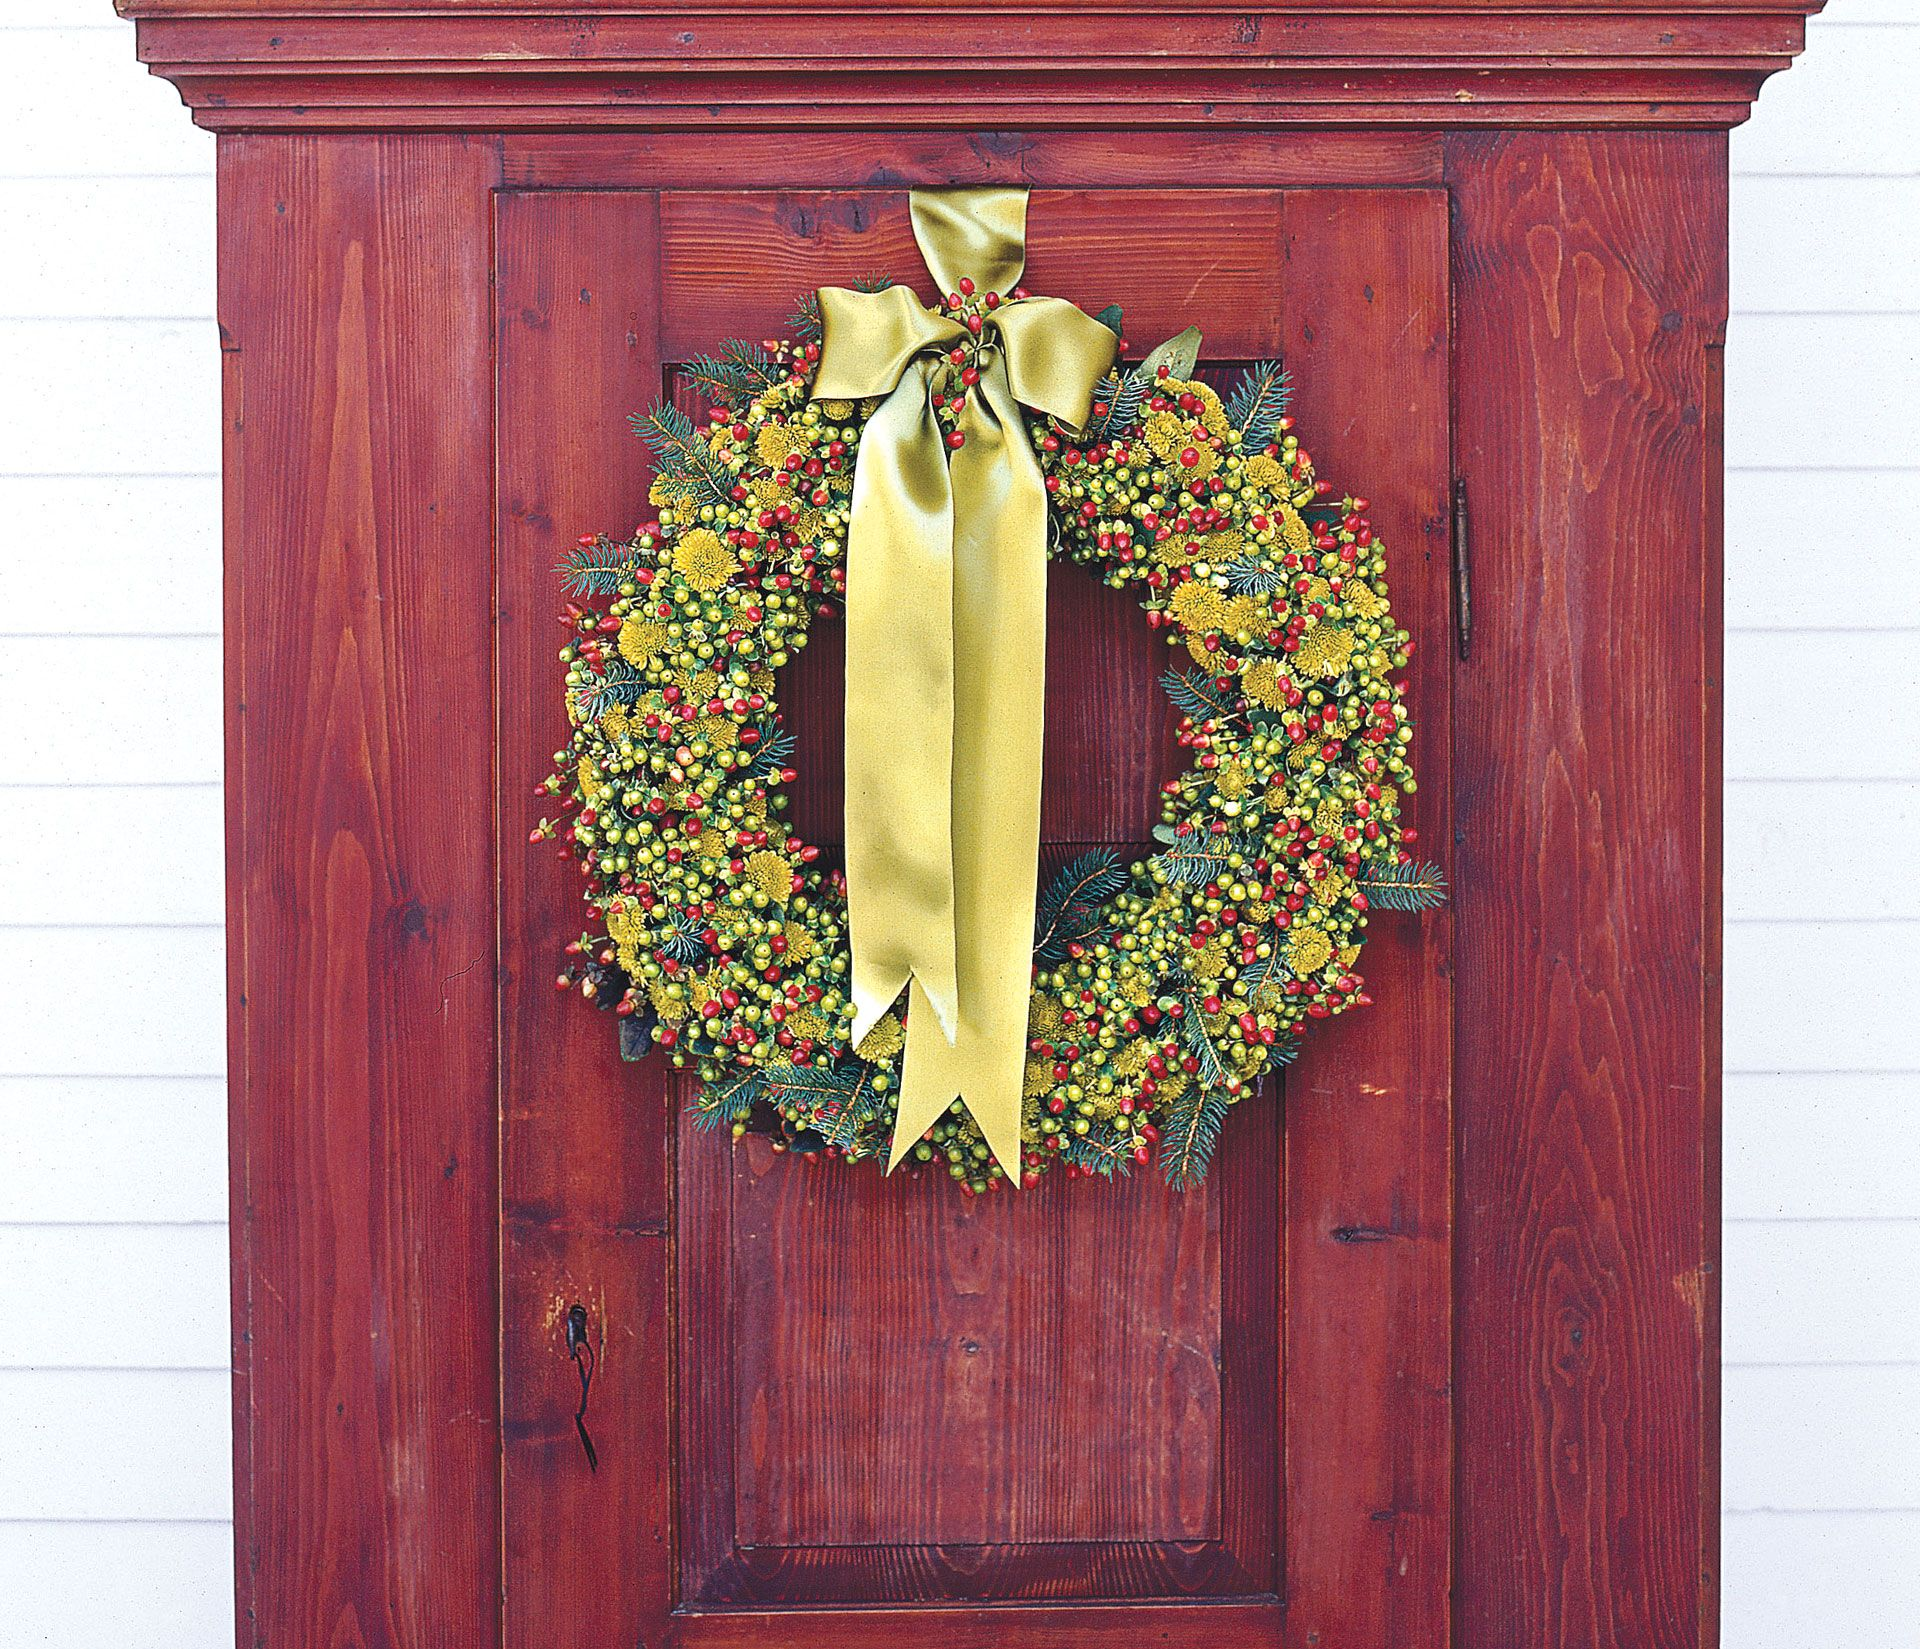 40 Christmas Door Decorating Ideas - Best Decorations for